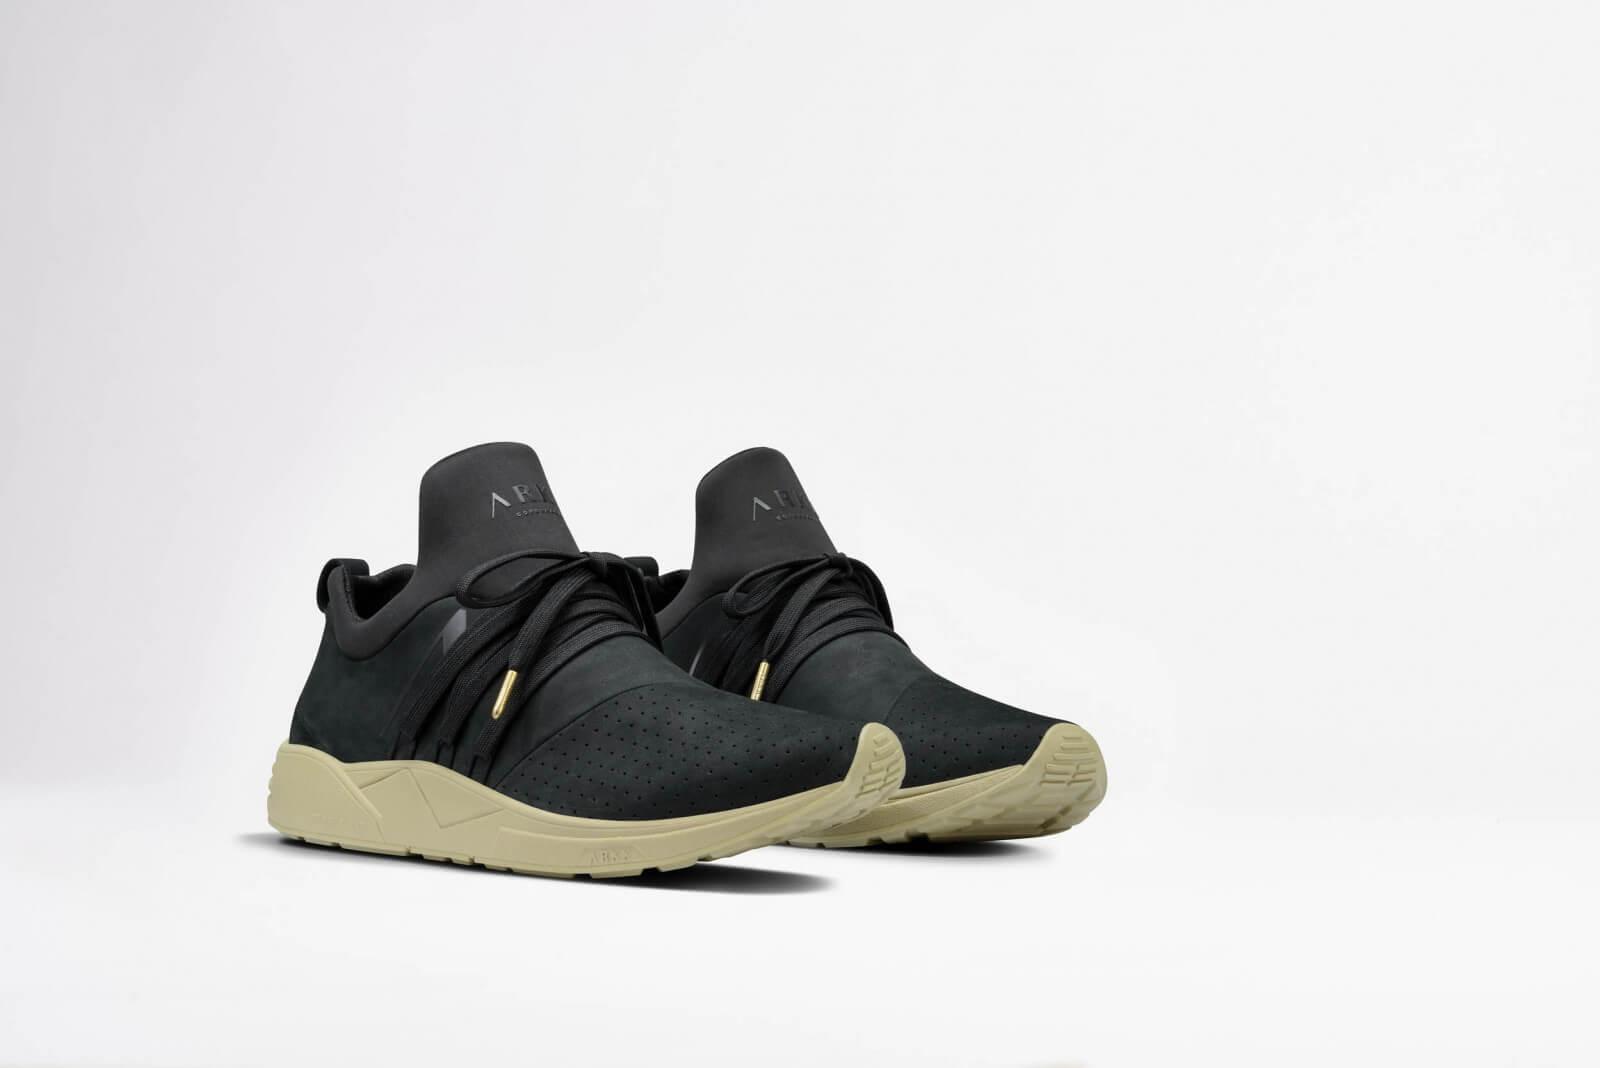 Arkk Chaussures De Sport Noir Ml1404-0099-m iw68nCKV